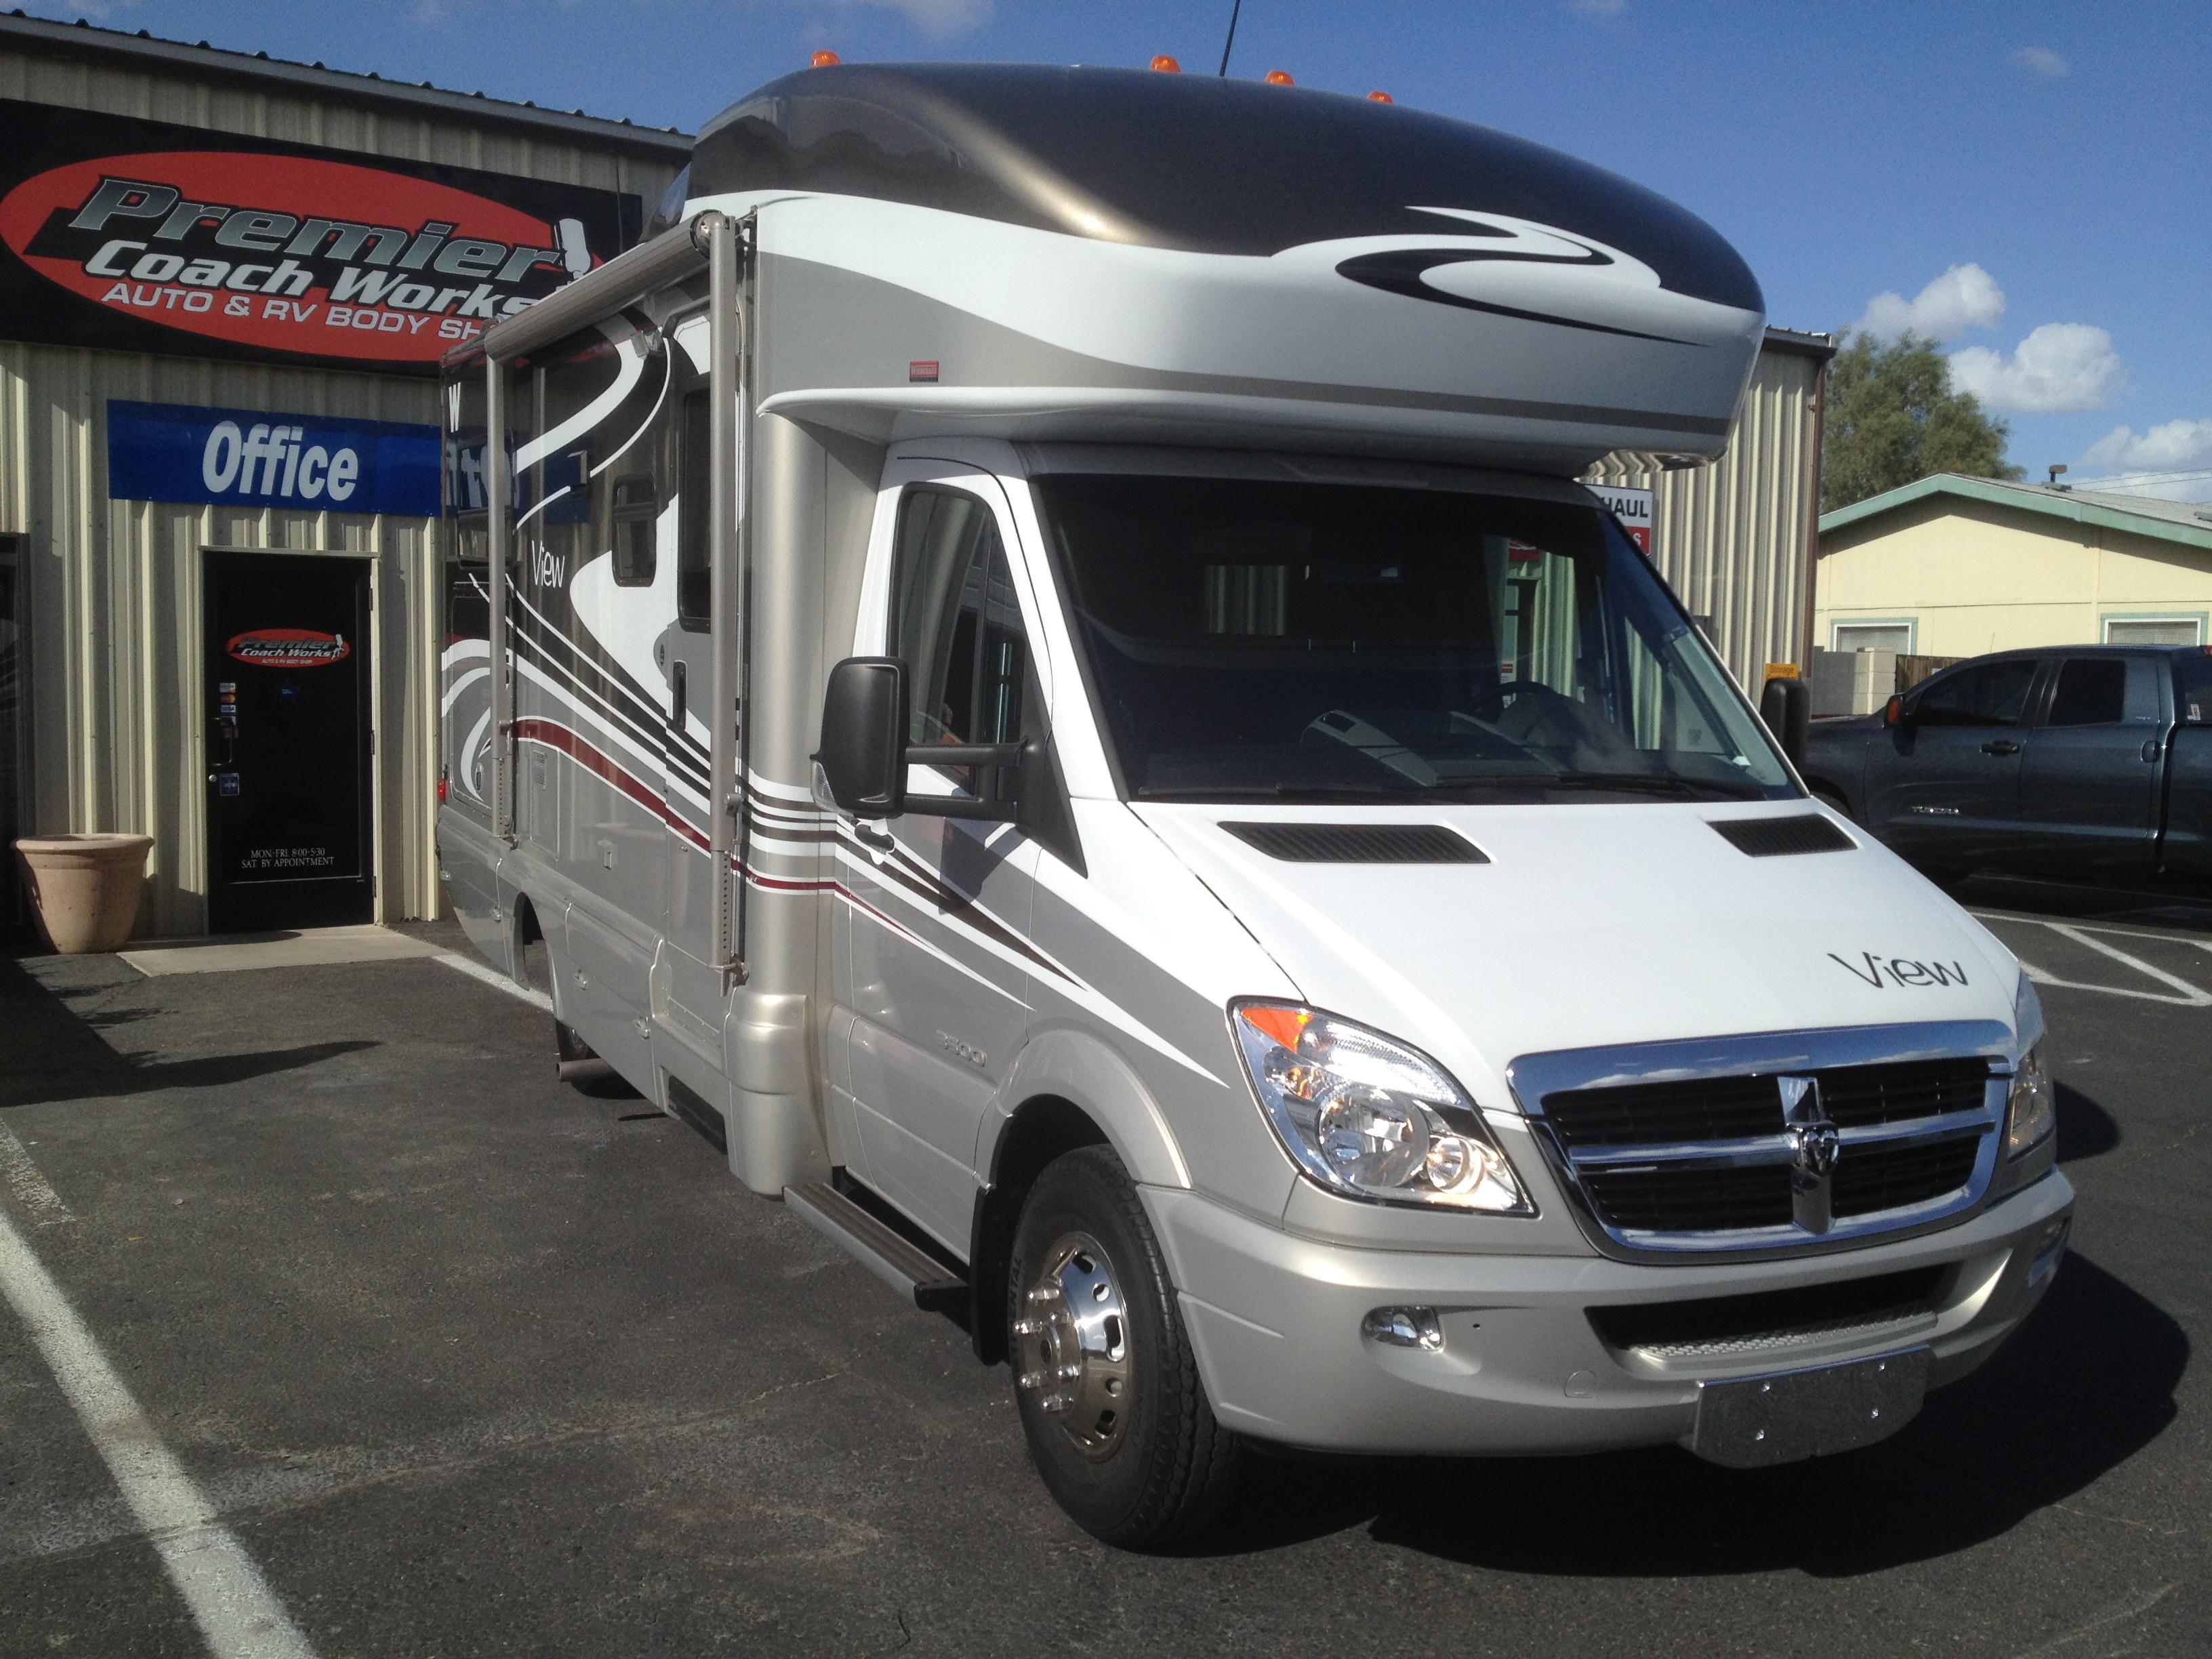 Premier Coach Works Auto & RV Body Shop